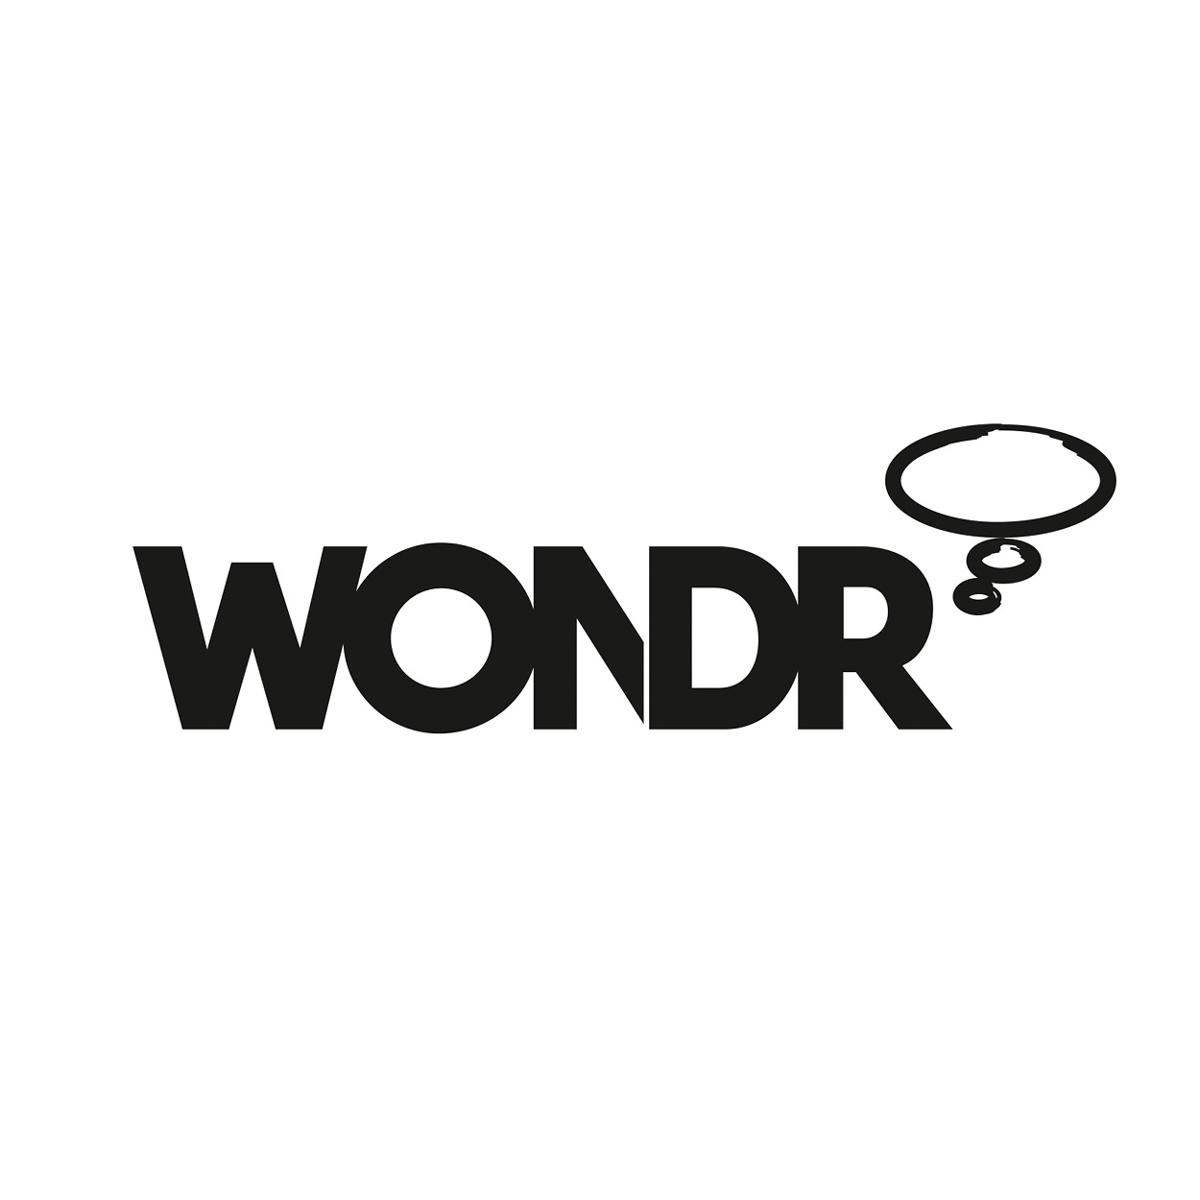 WONDR Logo